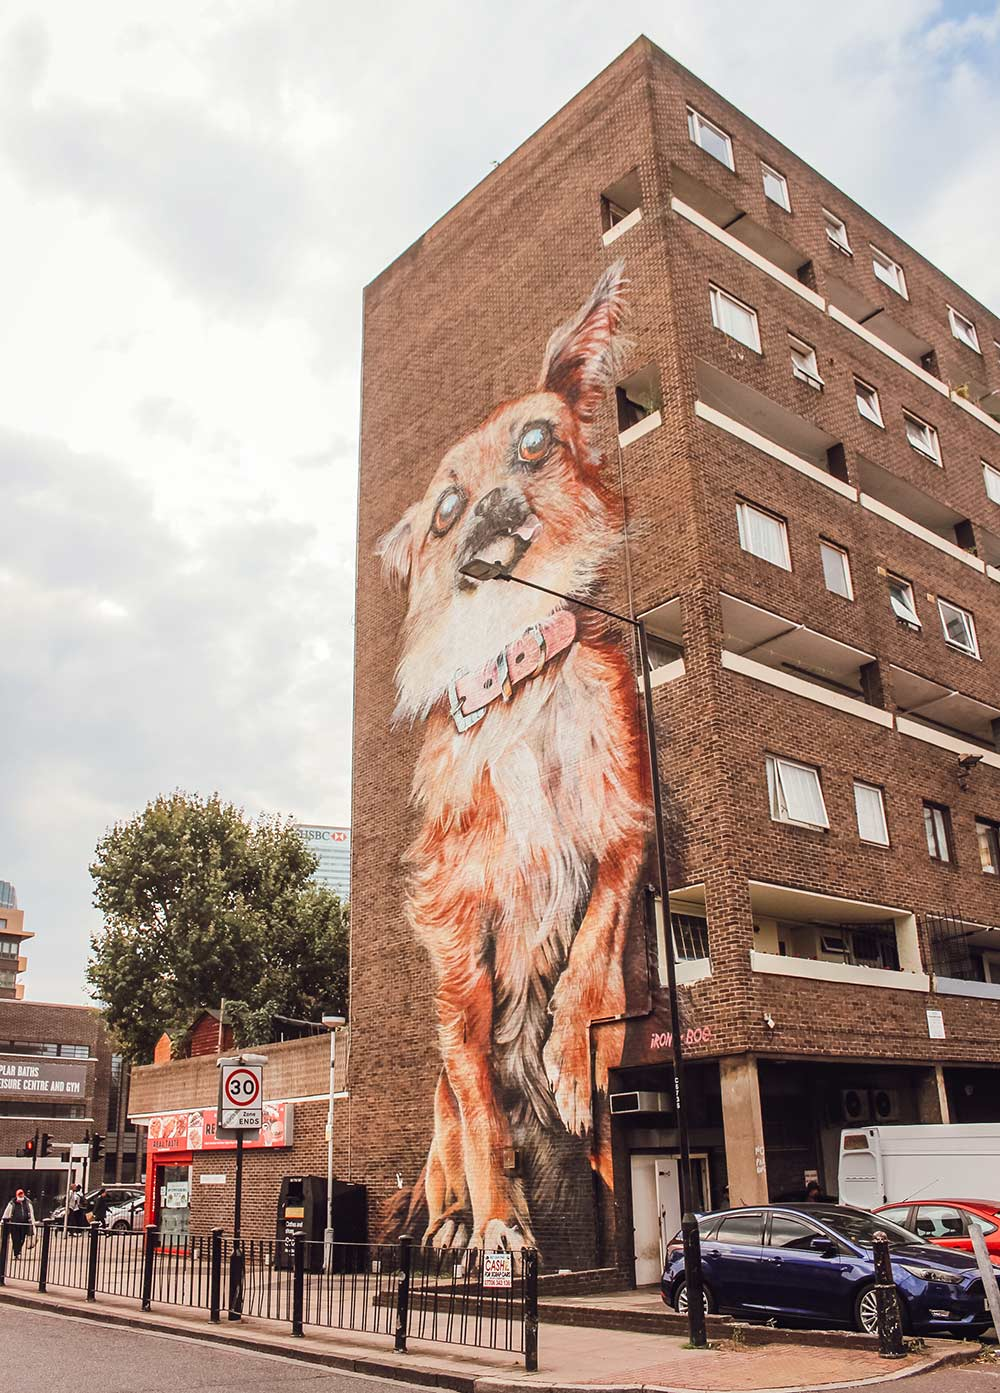 giant chihuahua street art Chrisp Street Market